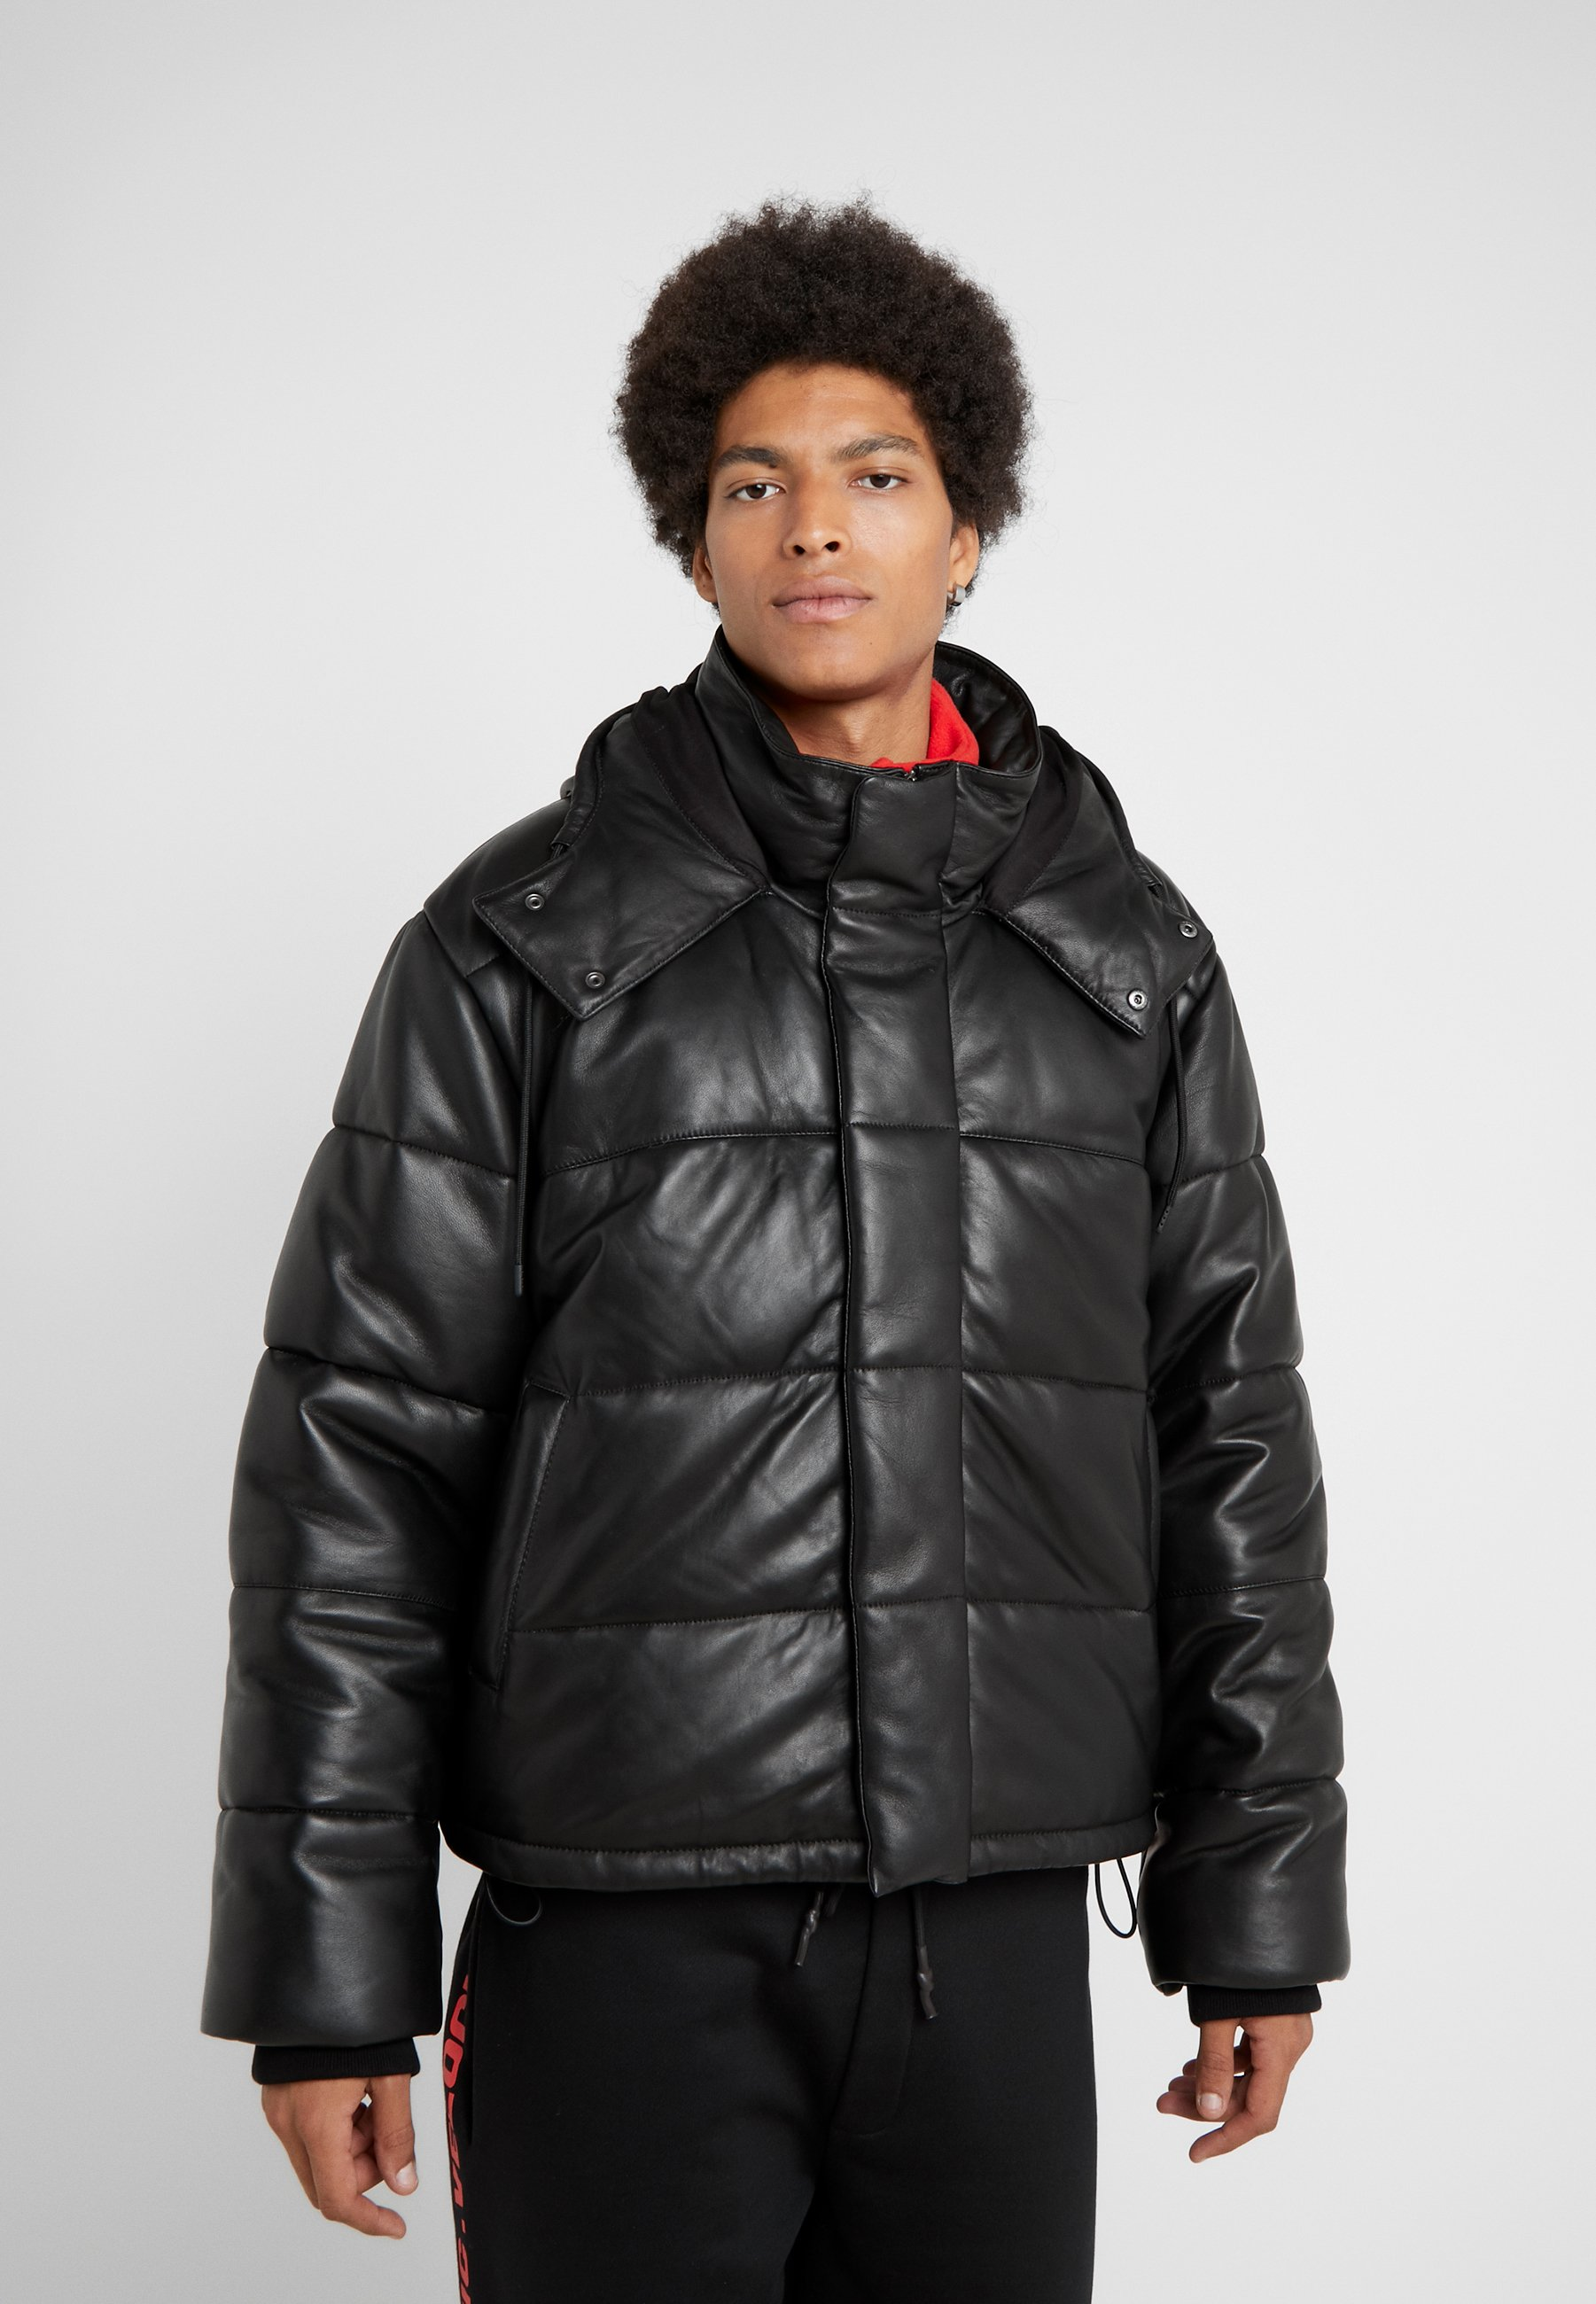 Mcq PufferVeste Darkest Alexander Mcqueen Black D'hiver lFK31TJc